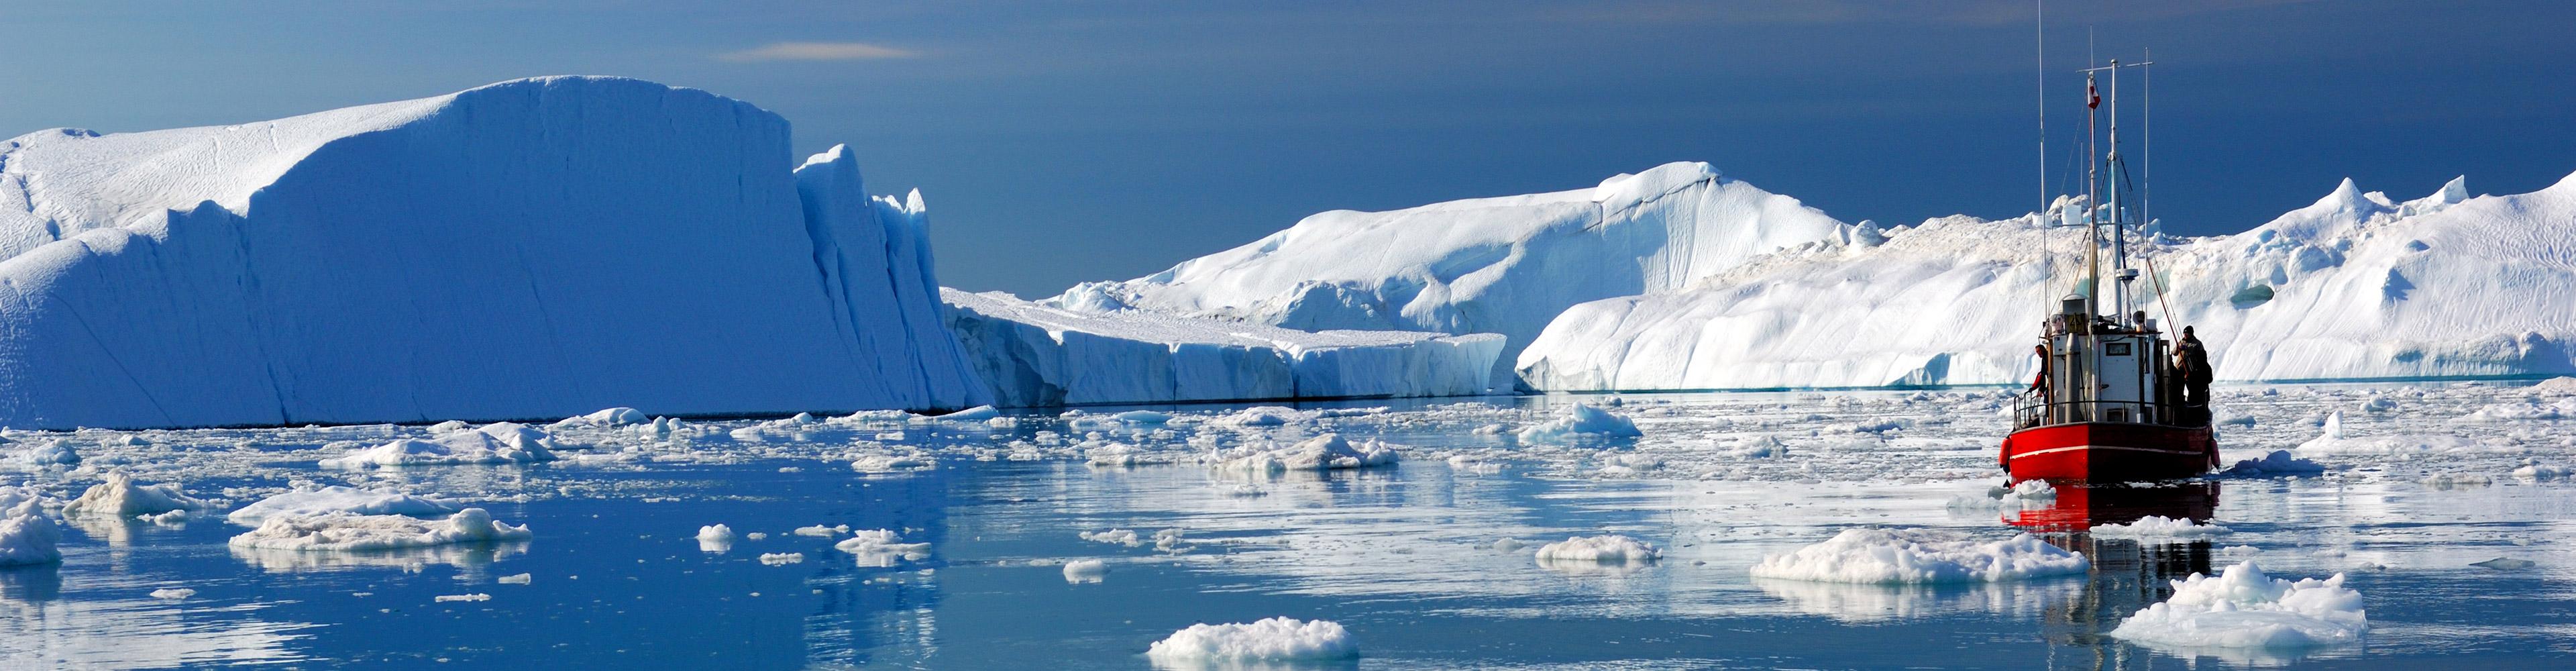 Greenland's Disko Bay